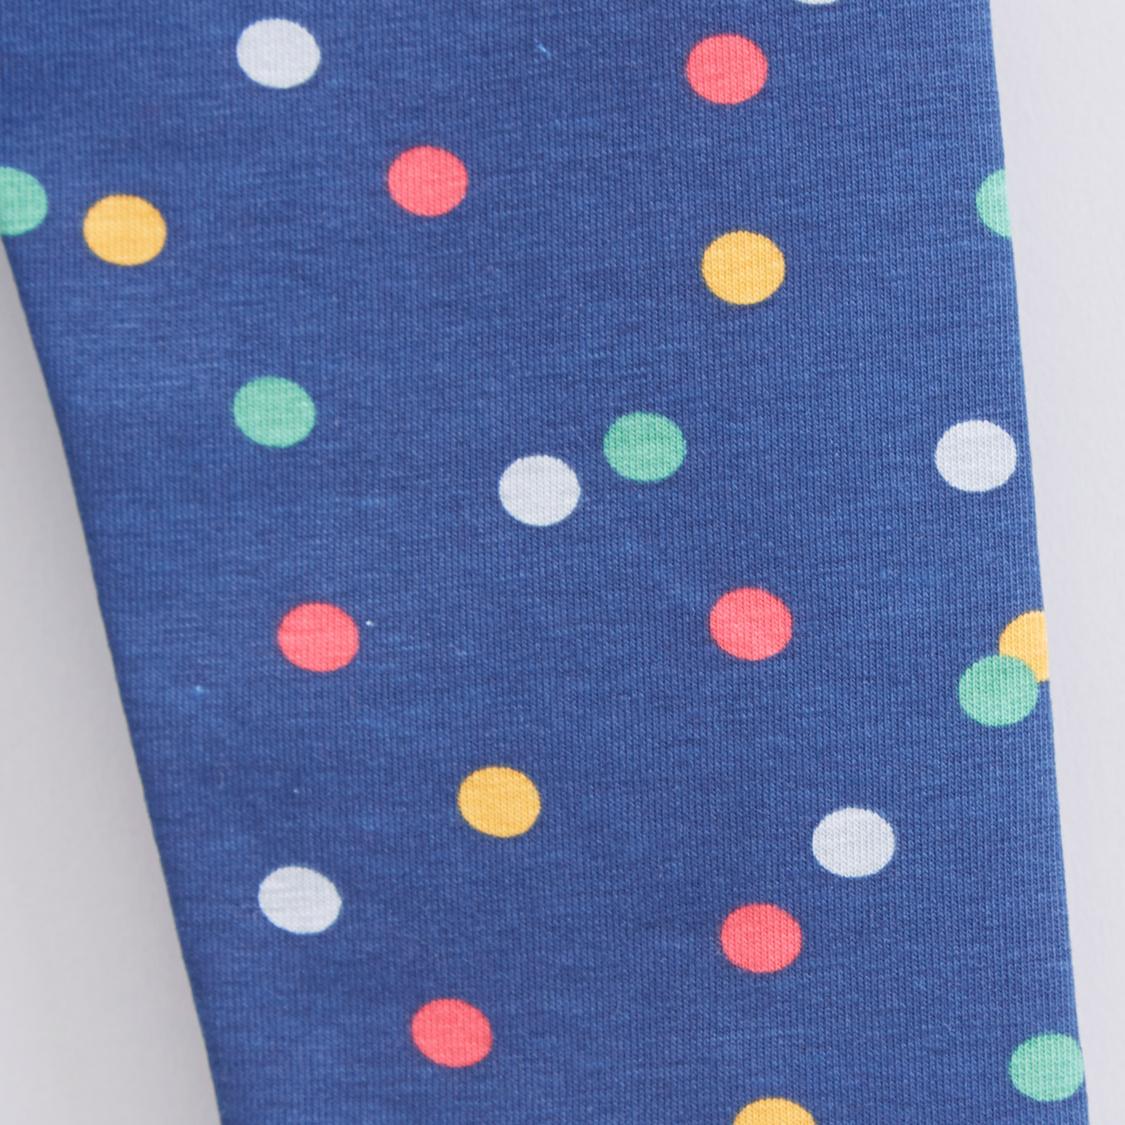 Polka Dot Printed Leggings with Elasticised Waistband